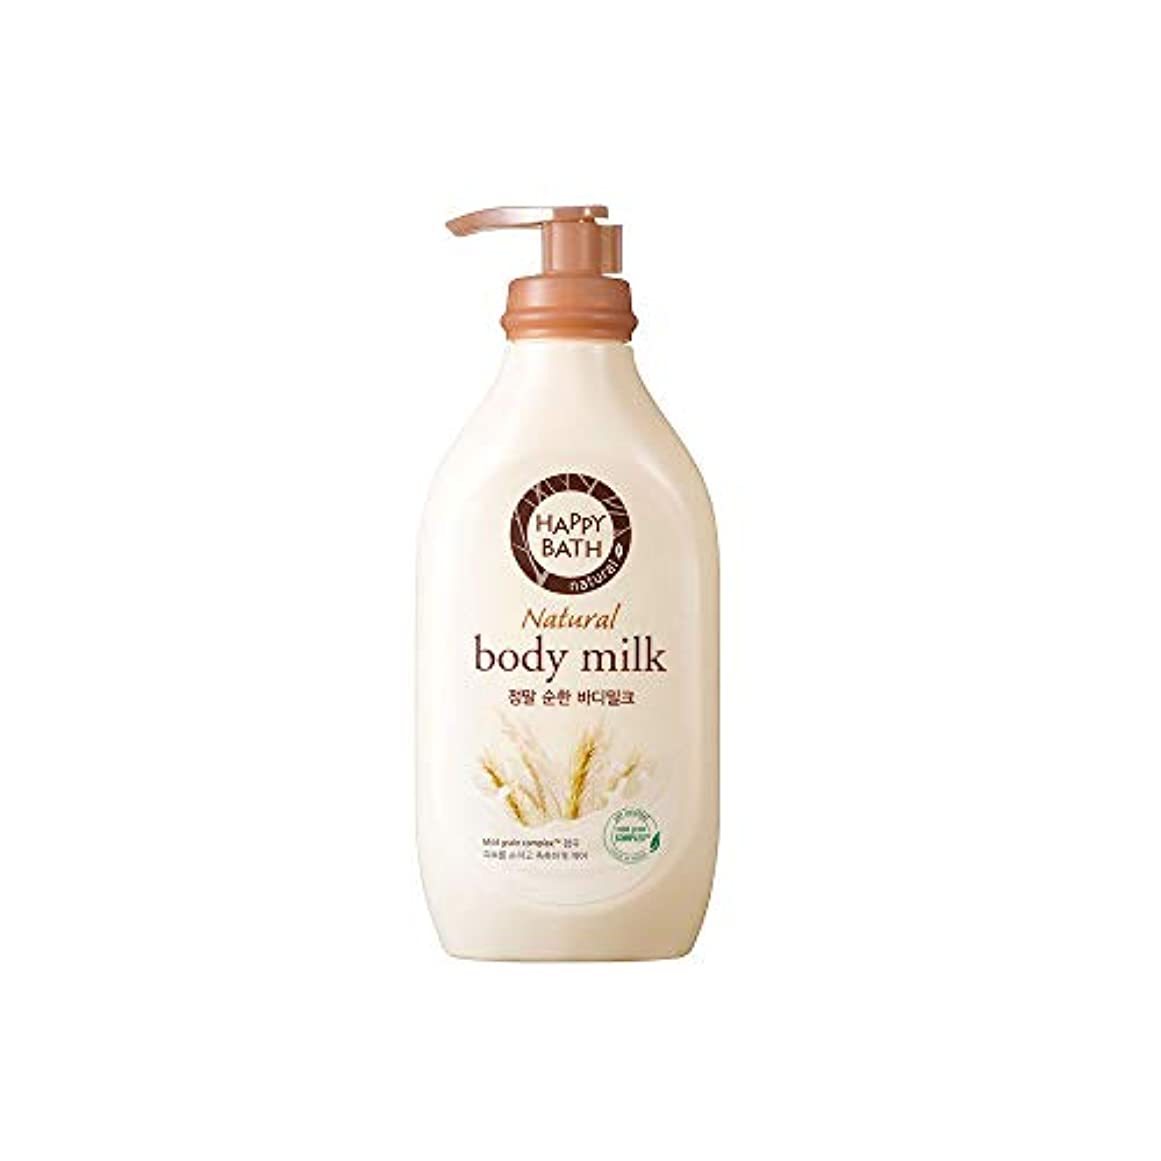 [HAPPY BATH] ハッピーバス ナチュラルボディミルク マイルドタイプ ボディローション 450ml (pure body milk 450ml)